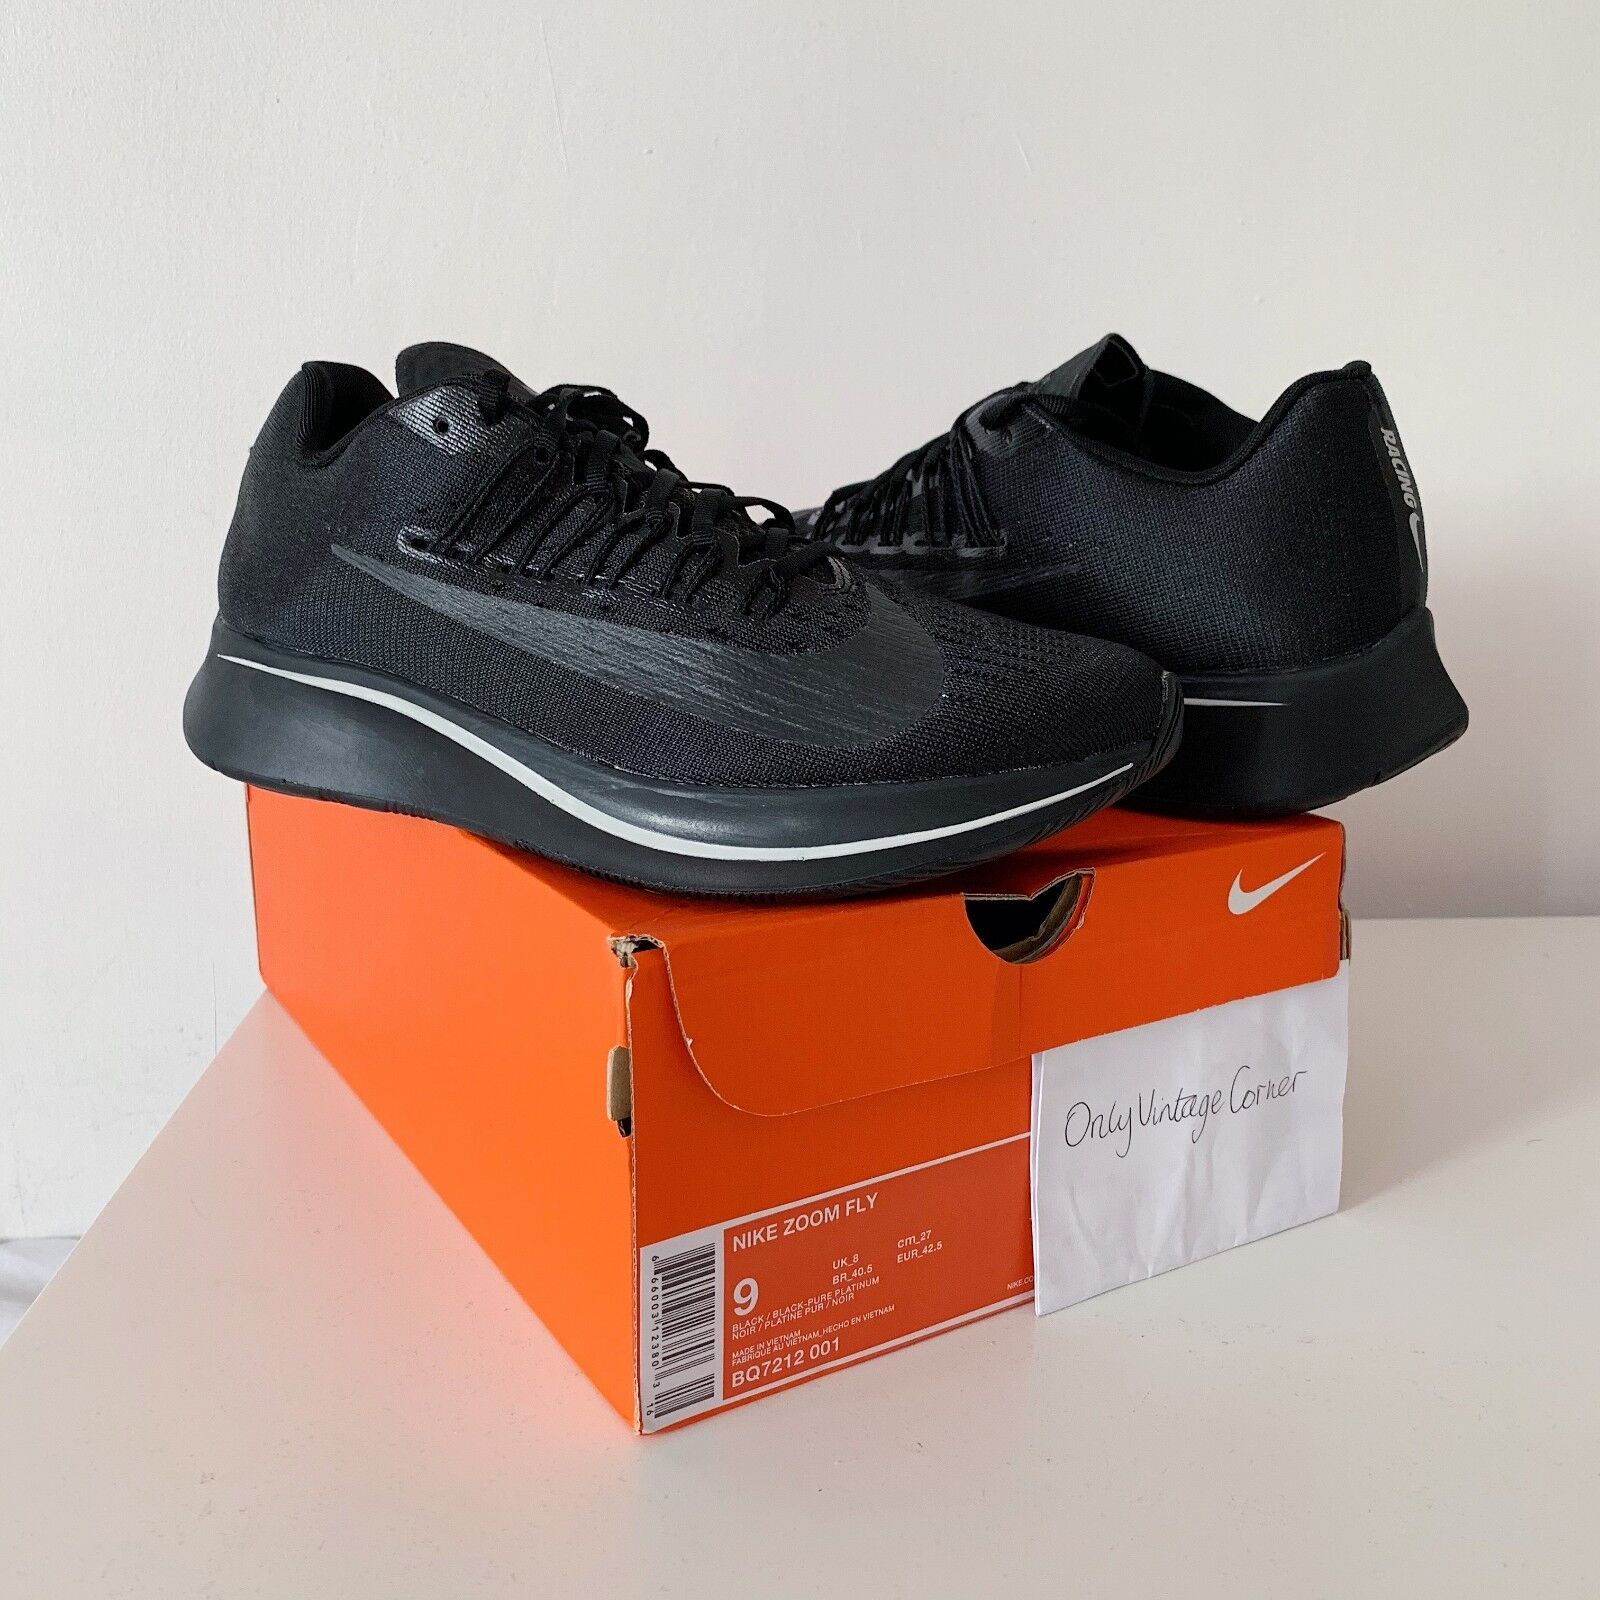 Nike zoom fliegen jd sports schwarz exclusive schwarz sports / cremefarbig uk8 ab bnib 100% echt b4e0a1